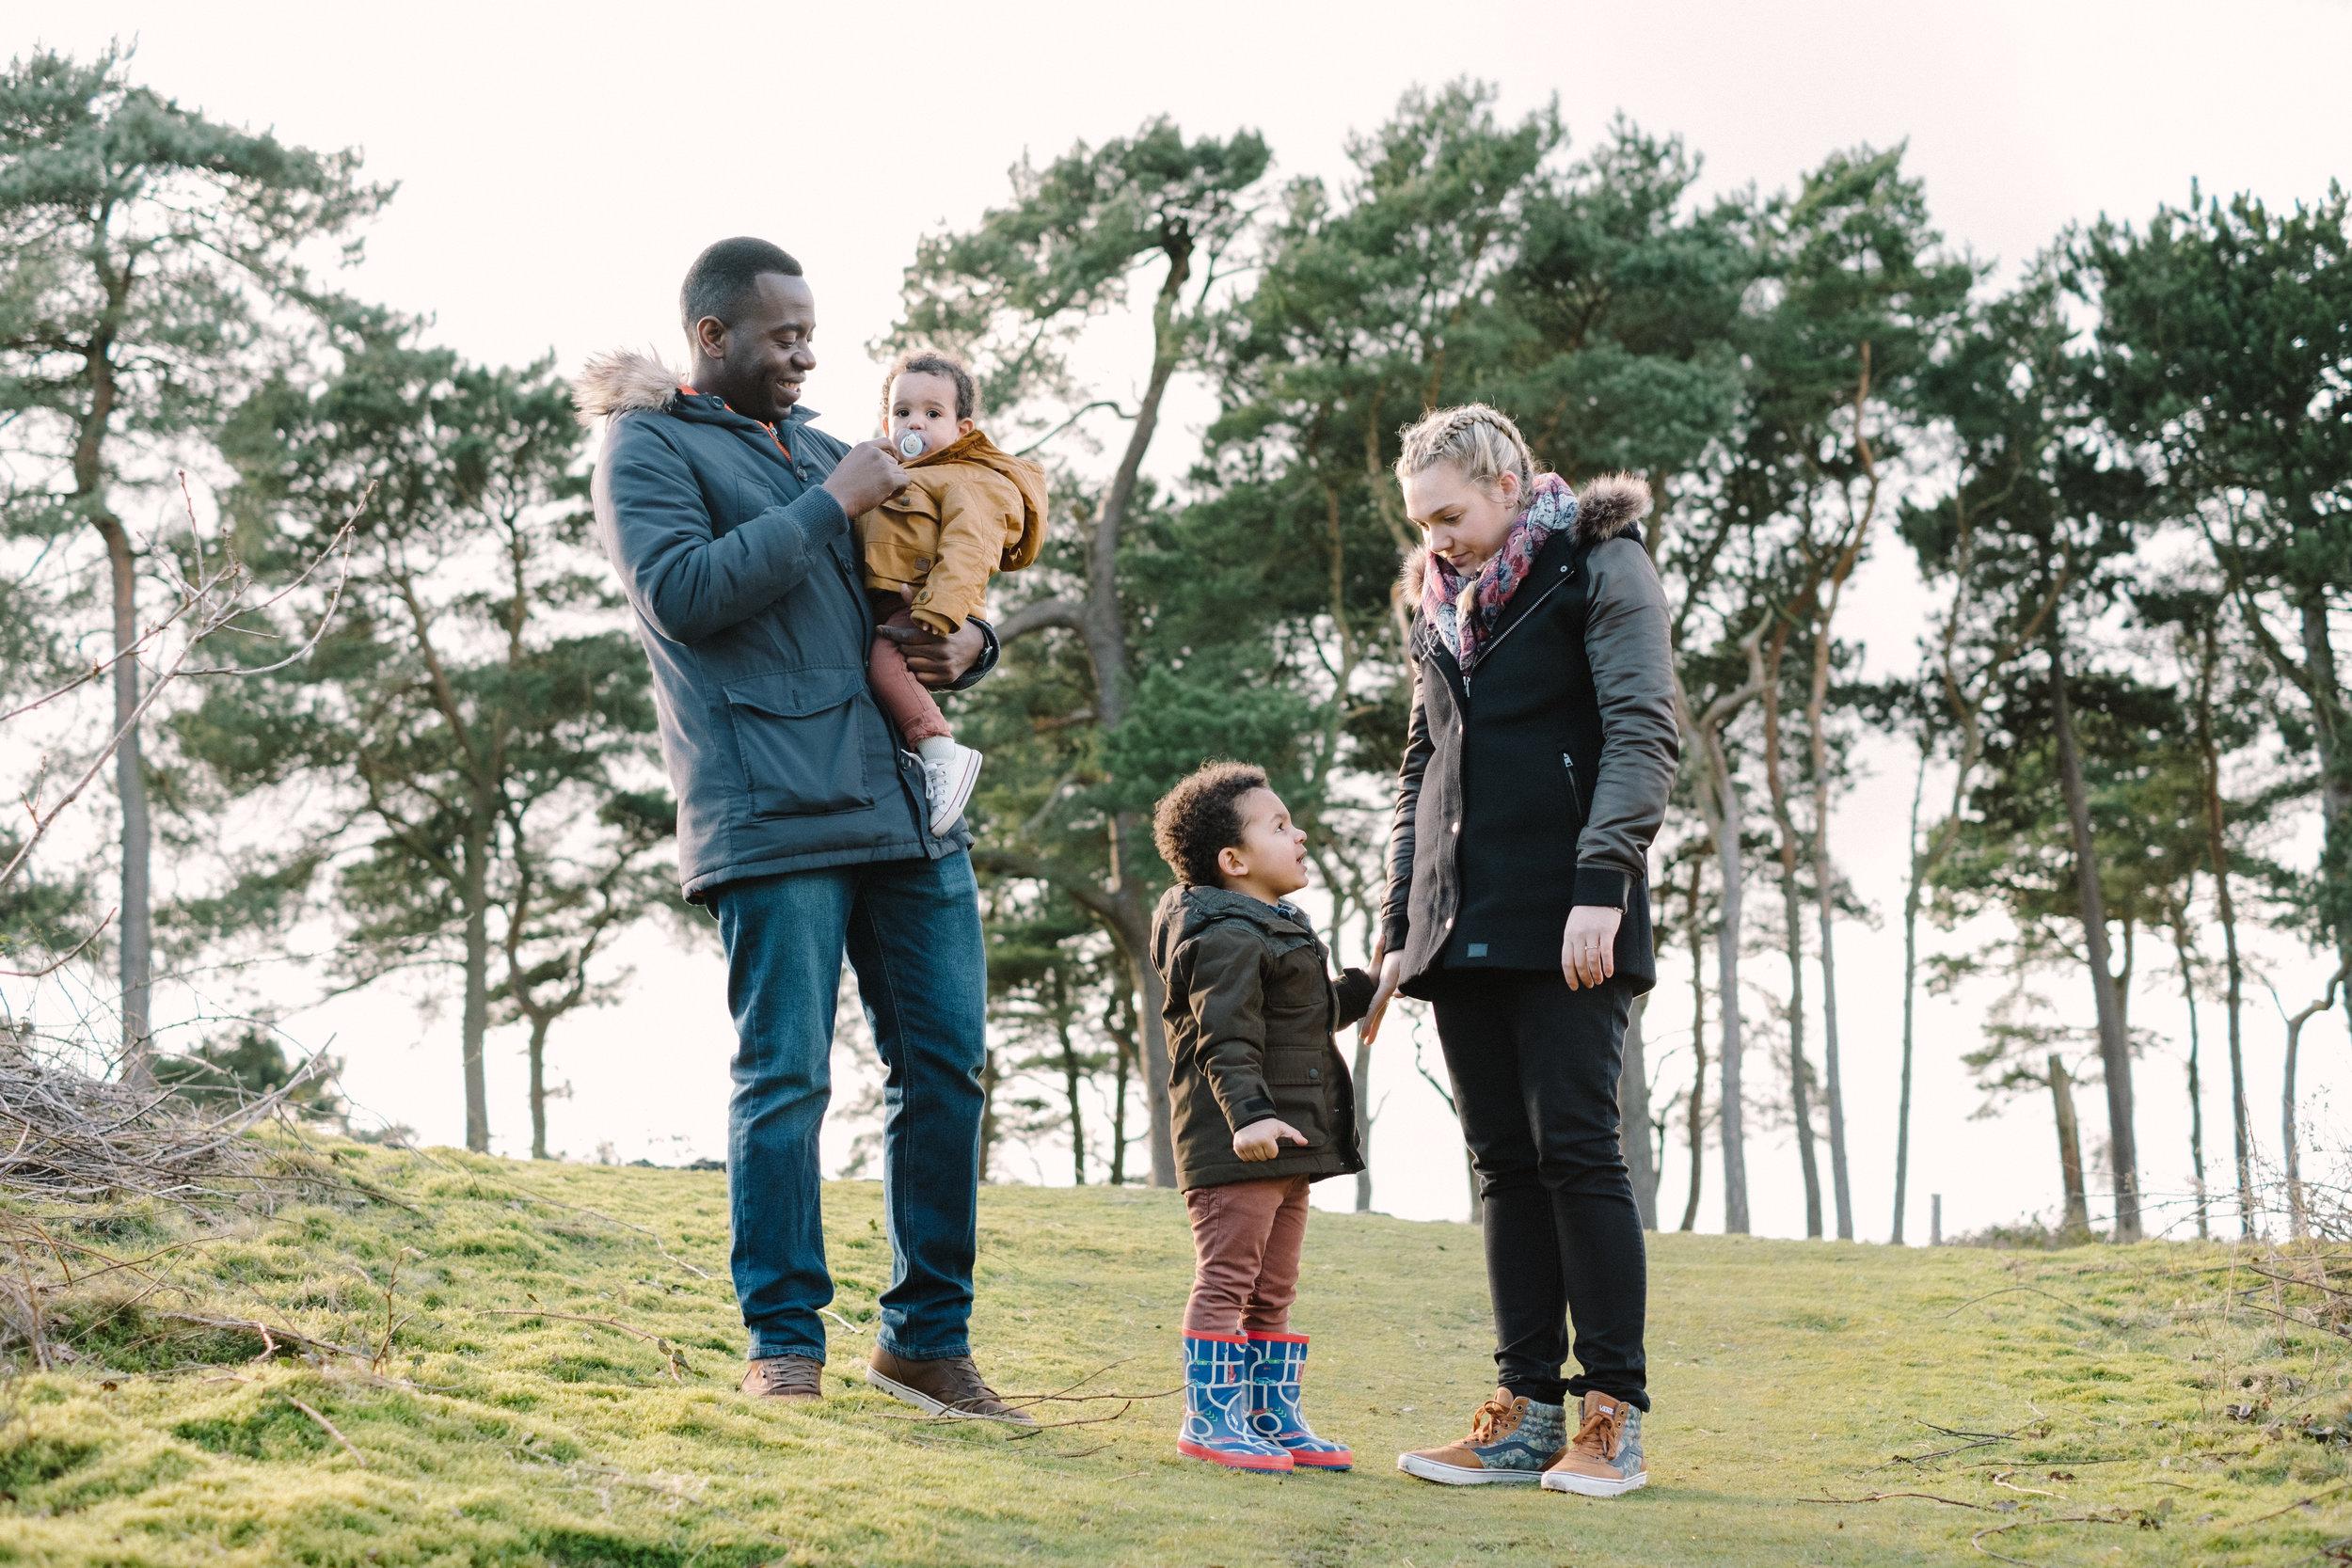 021-darren--katie-family-engagement-shoot_38592090240_o.jpg